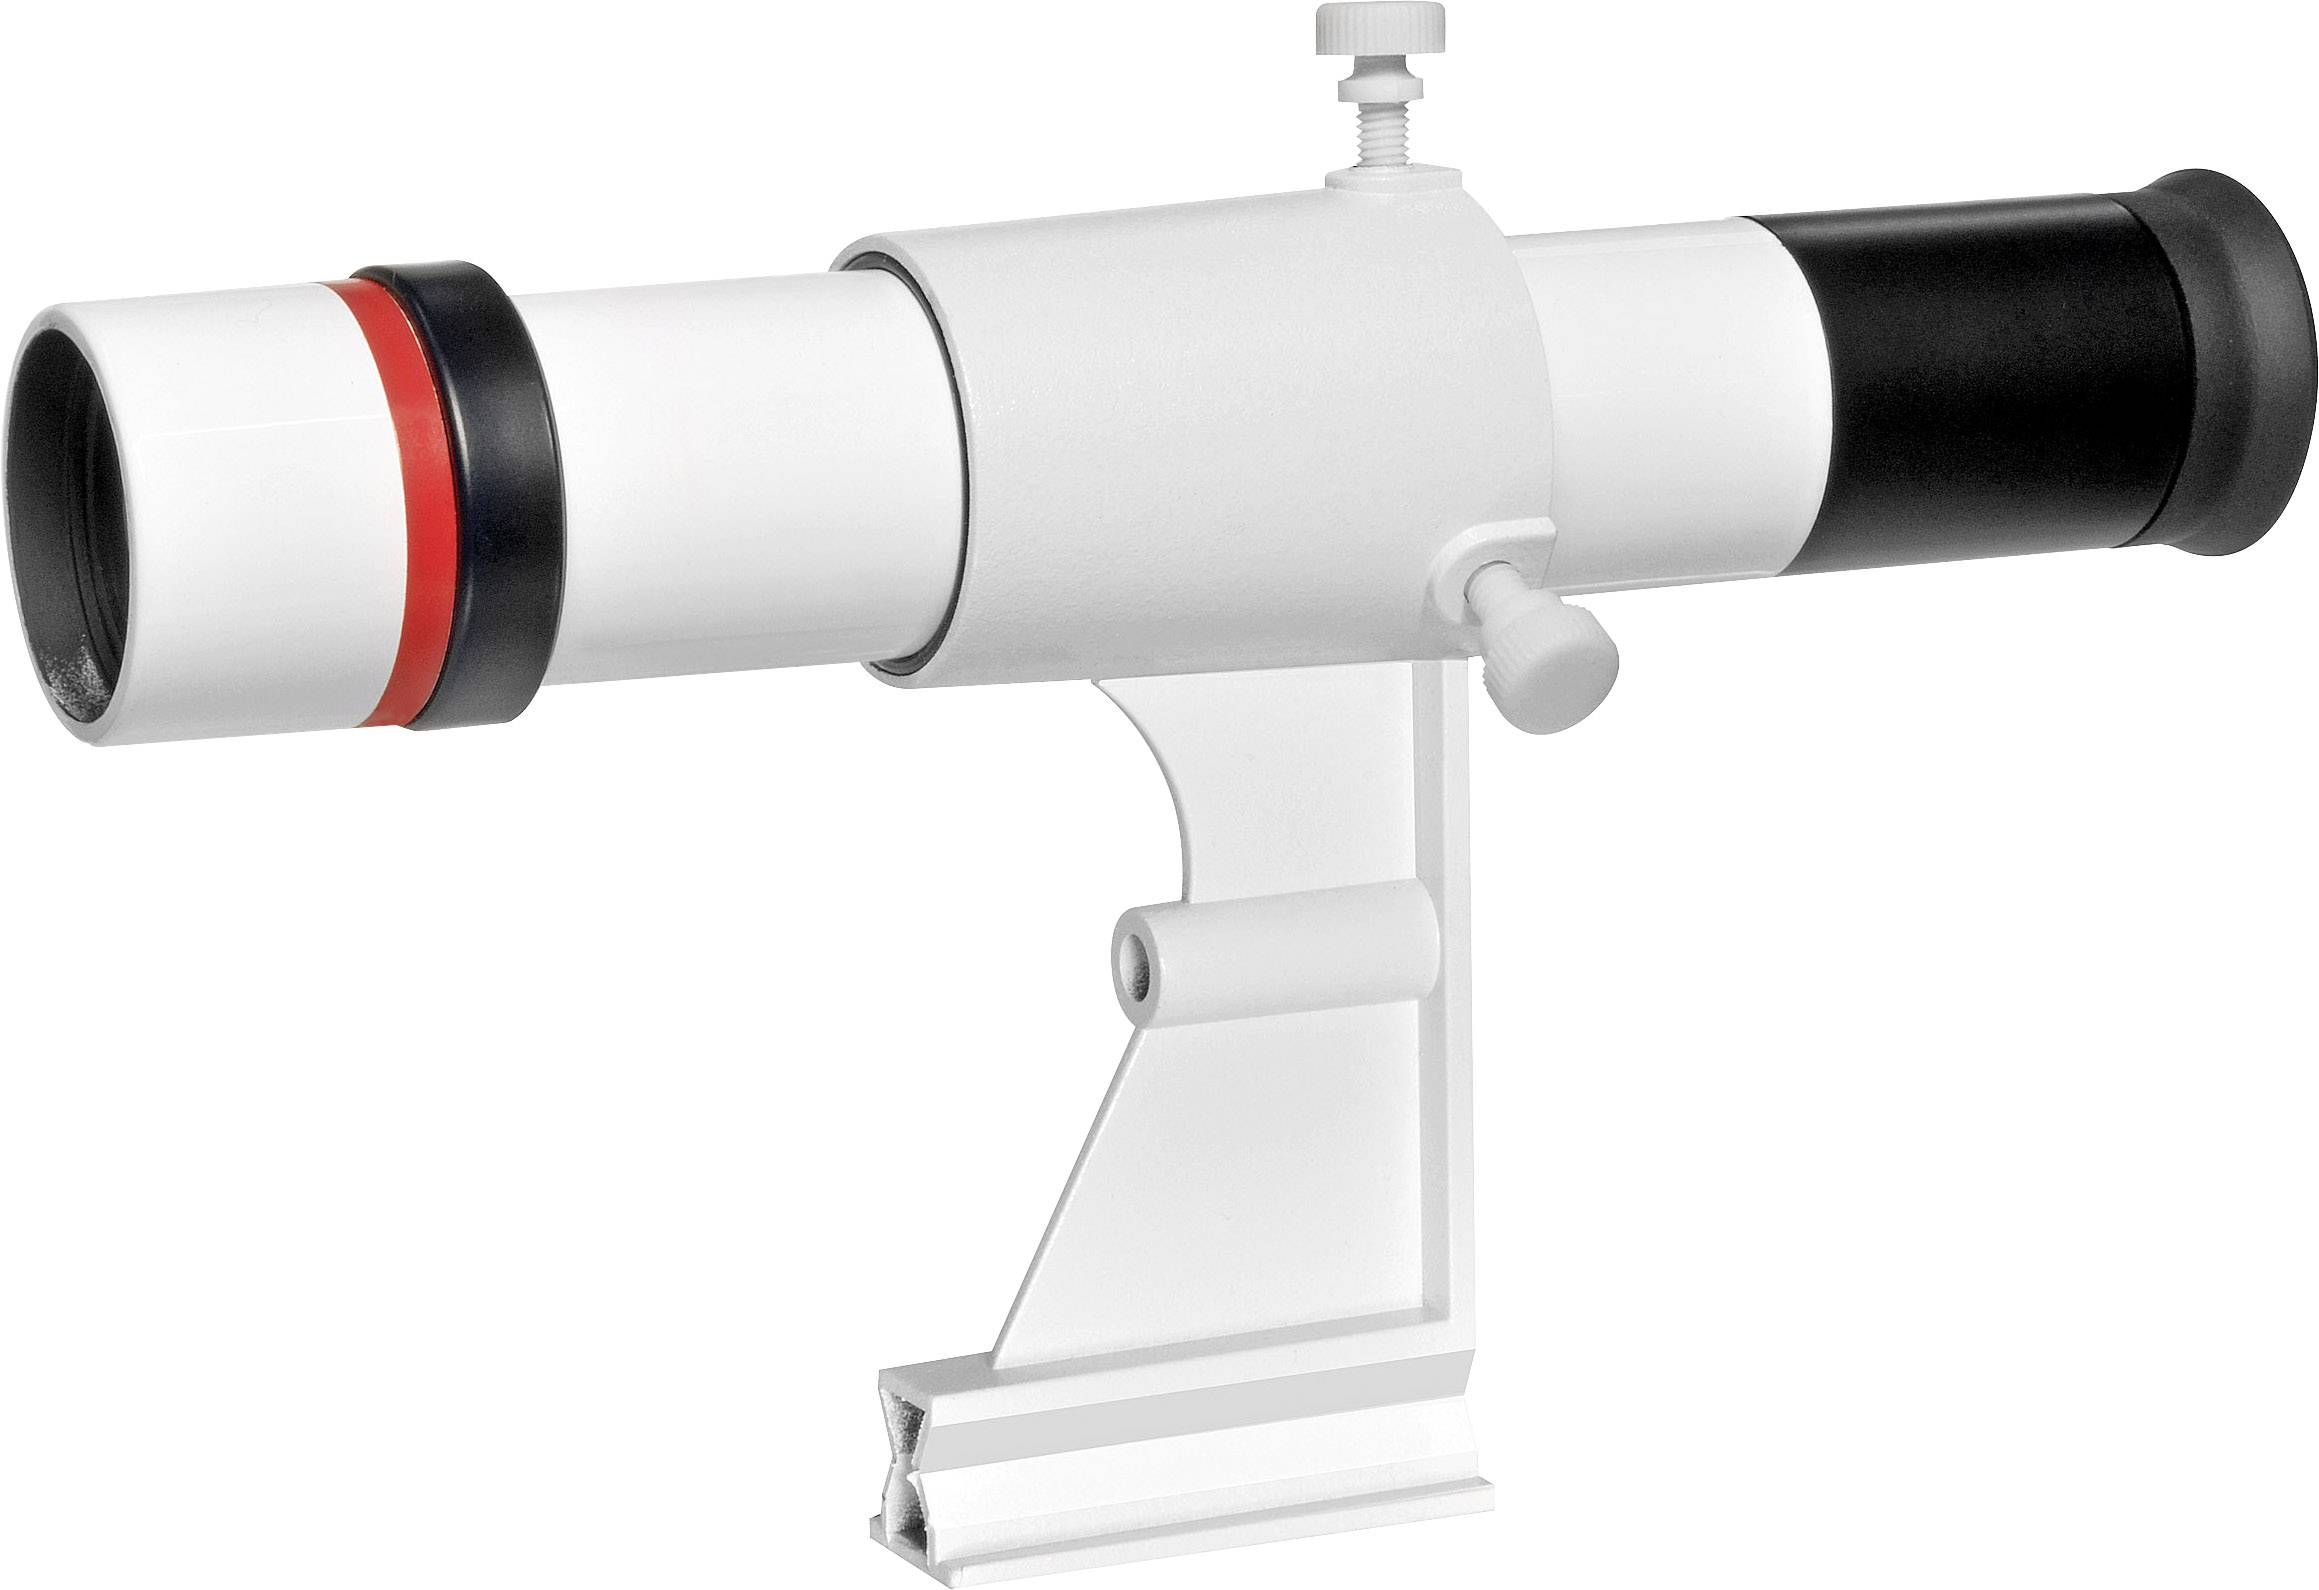 Bresser messier maksutov eq teleskop ab